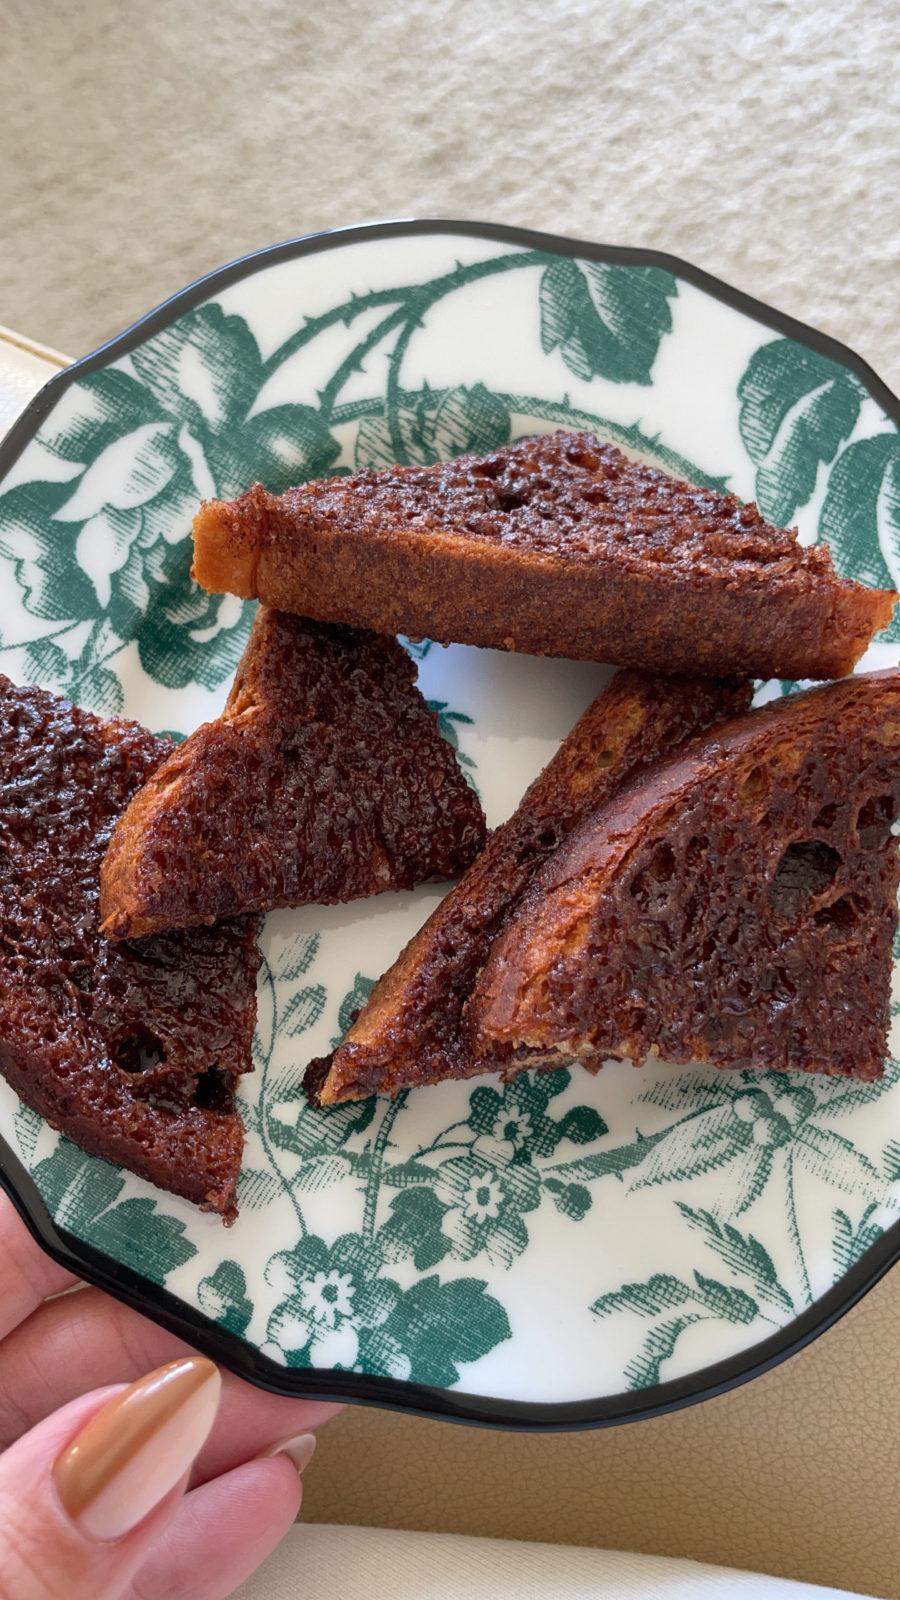 Kourtney Kardashian cinnamon toast recipe